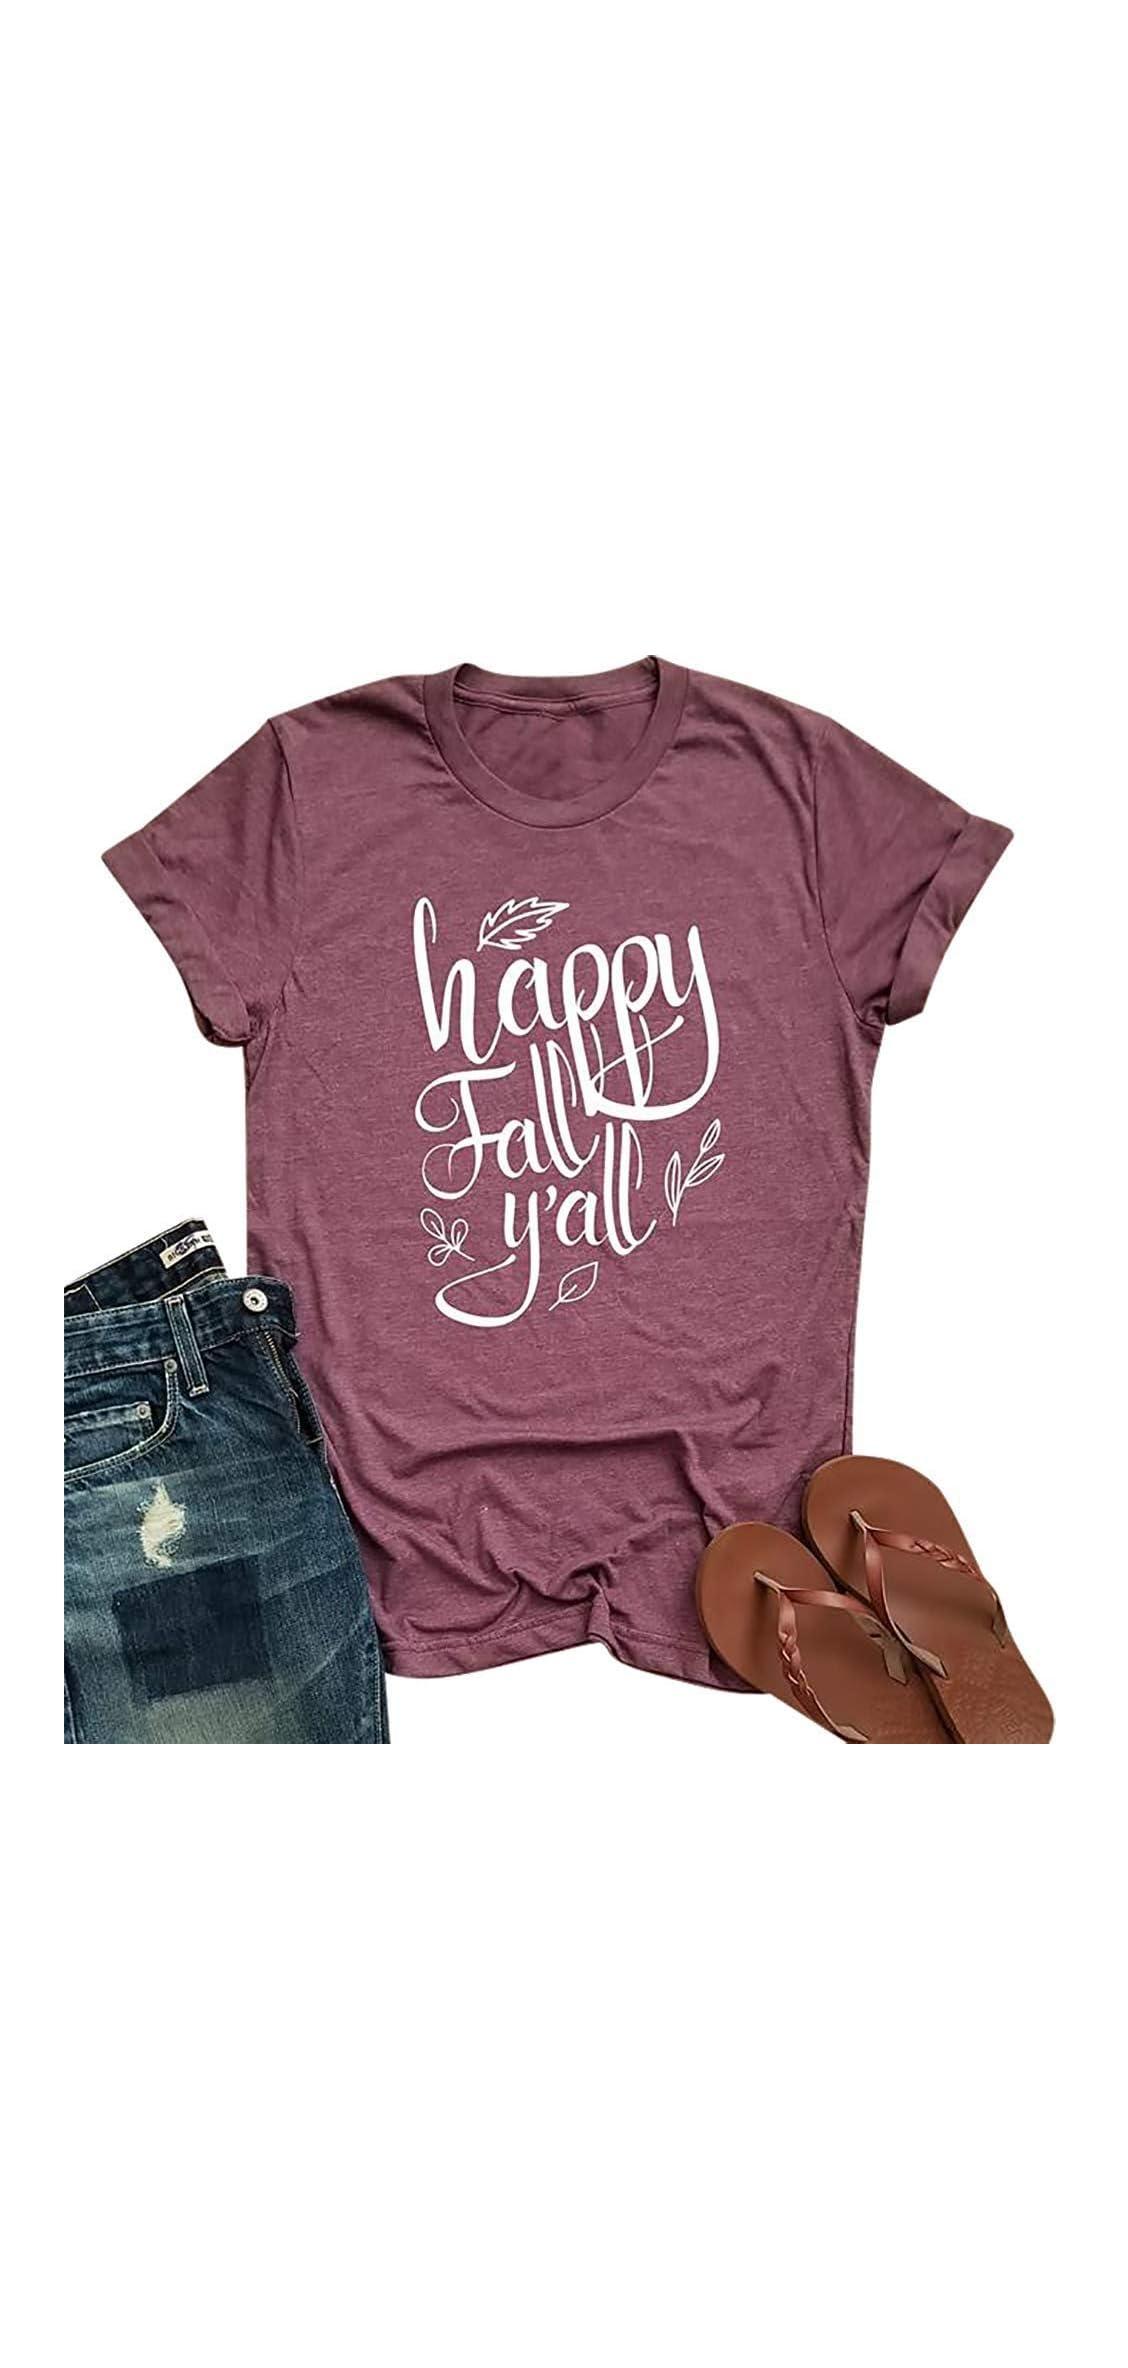 Happy Fall Y'all Shirt Women Cute Leaves Print Graphic Tees Fall